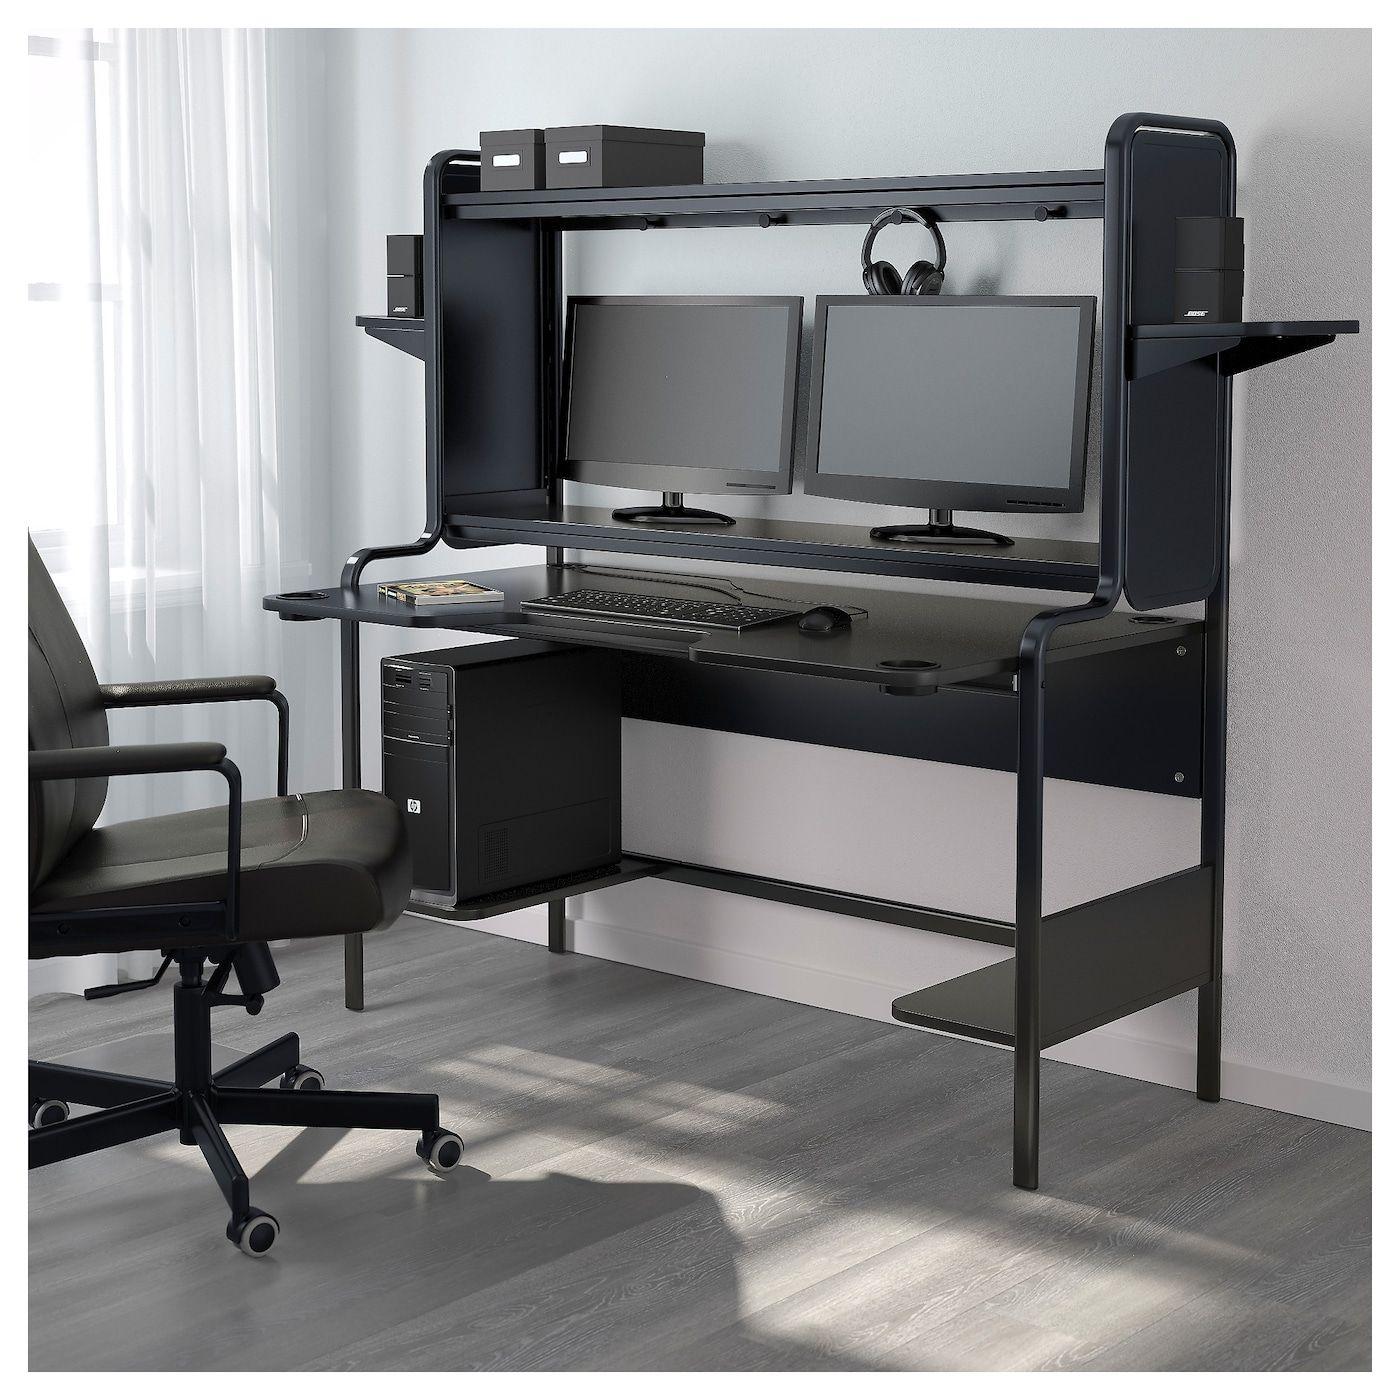 Fredde Bureau Noir 185x74x146 Cm Ikea Room Setup Diy Computer Desk Ikea Gaming Desk